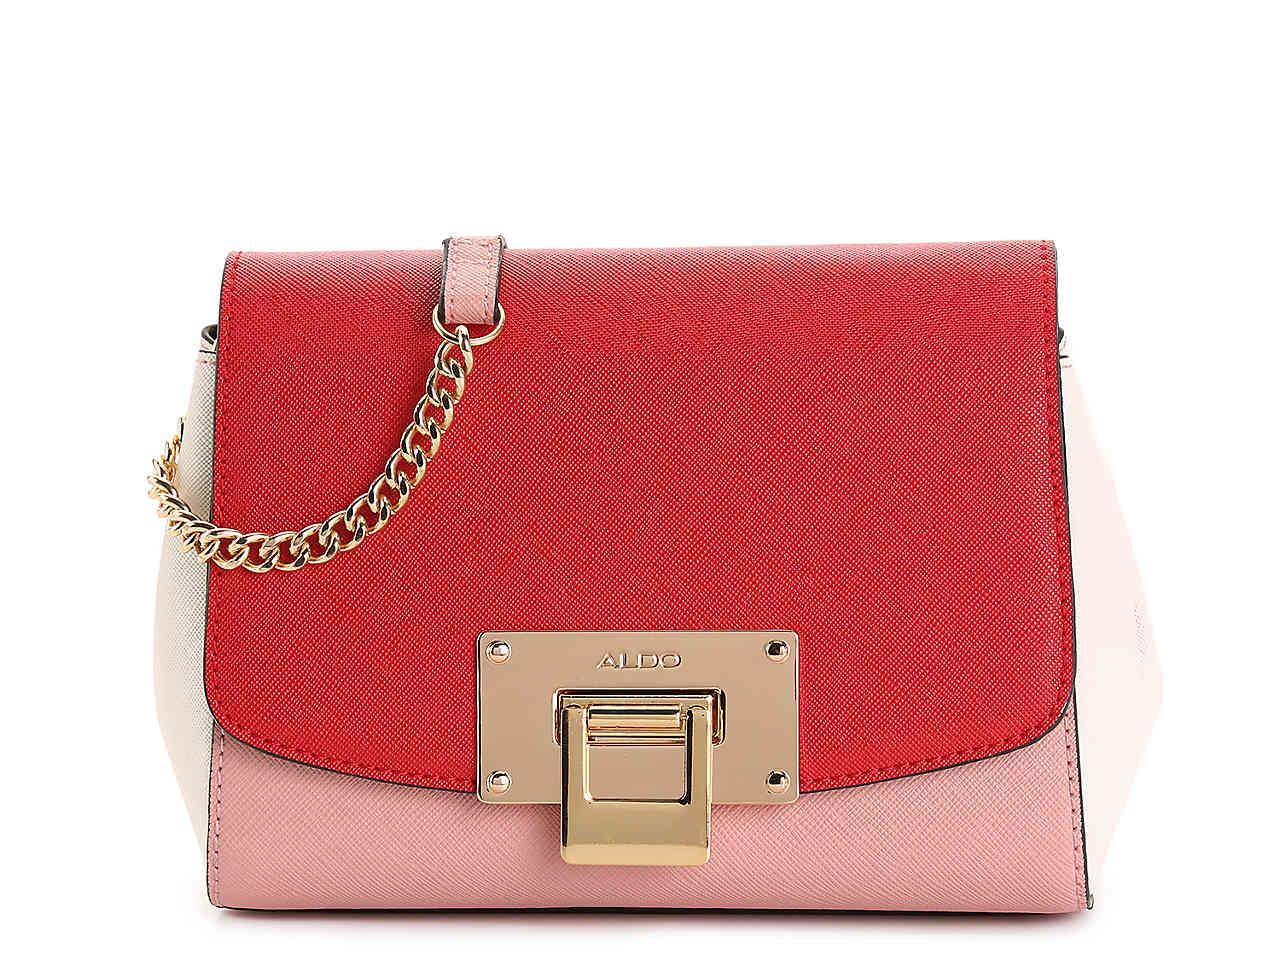 07076647a8 ALDO - Red Rotella Crossbody Bag - Lyst. View fullscreen